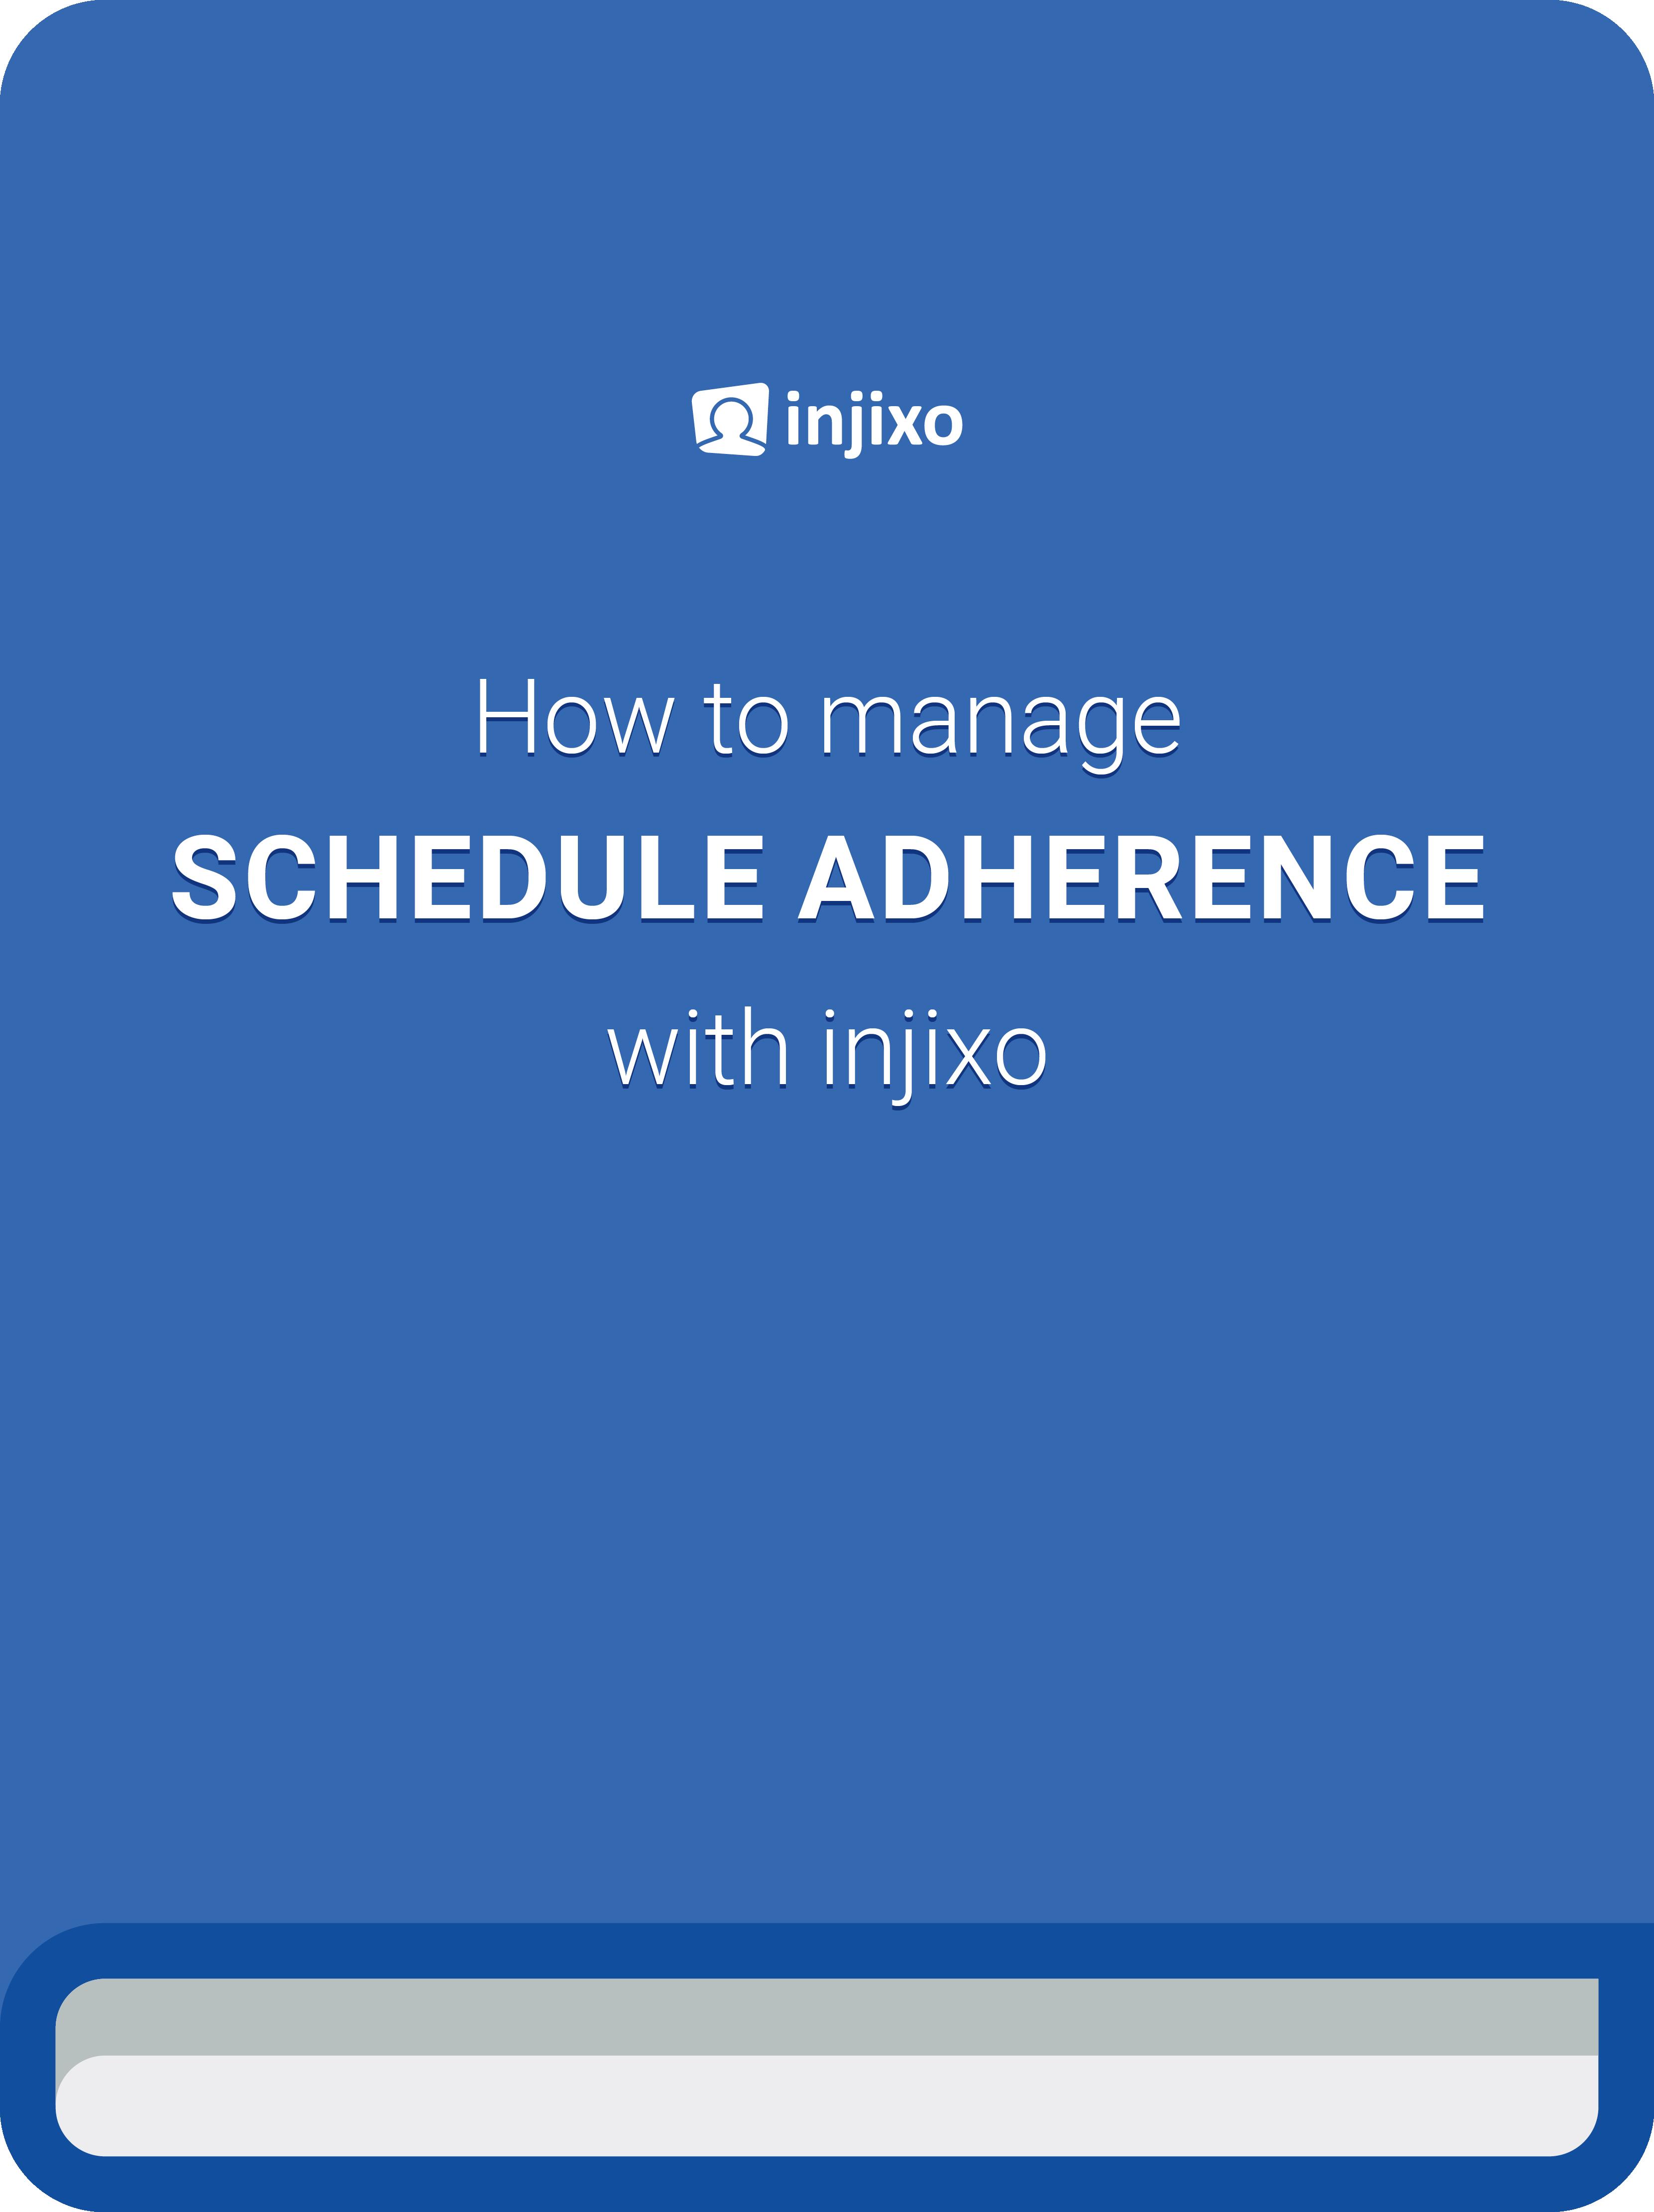 injixo contact center schedule adherence